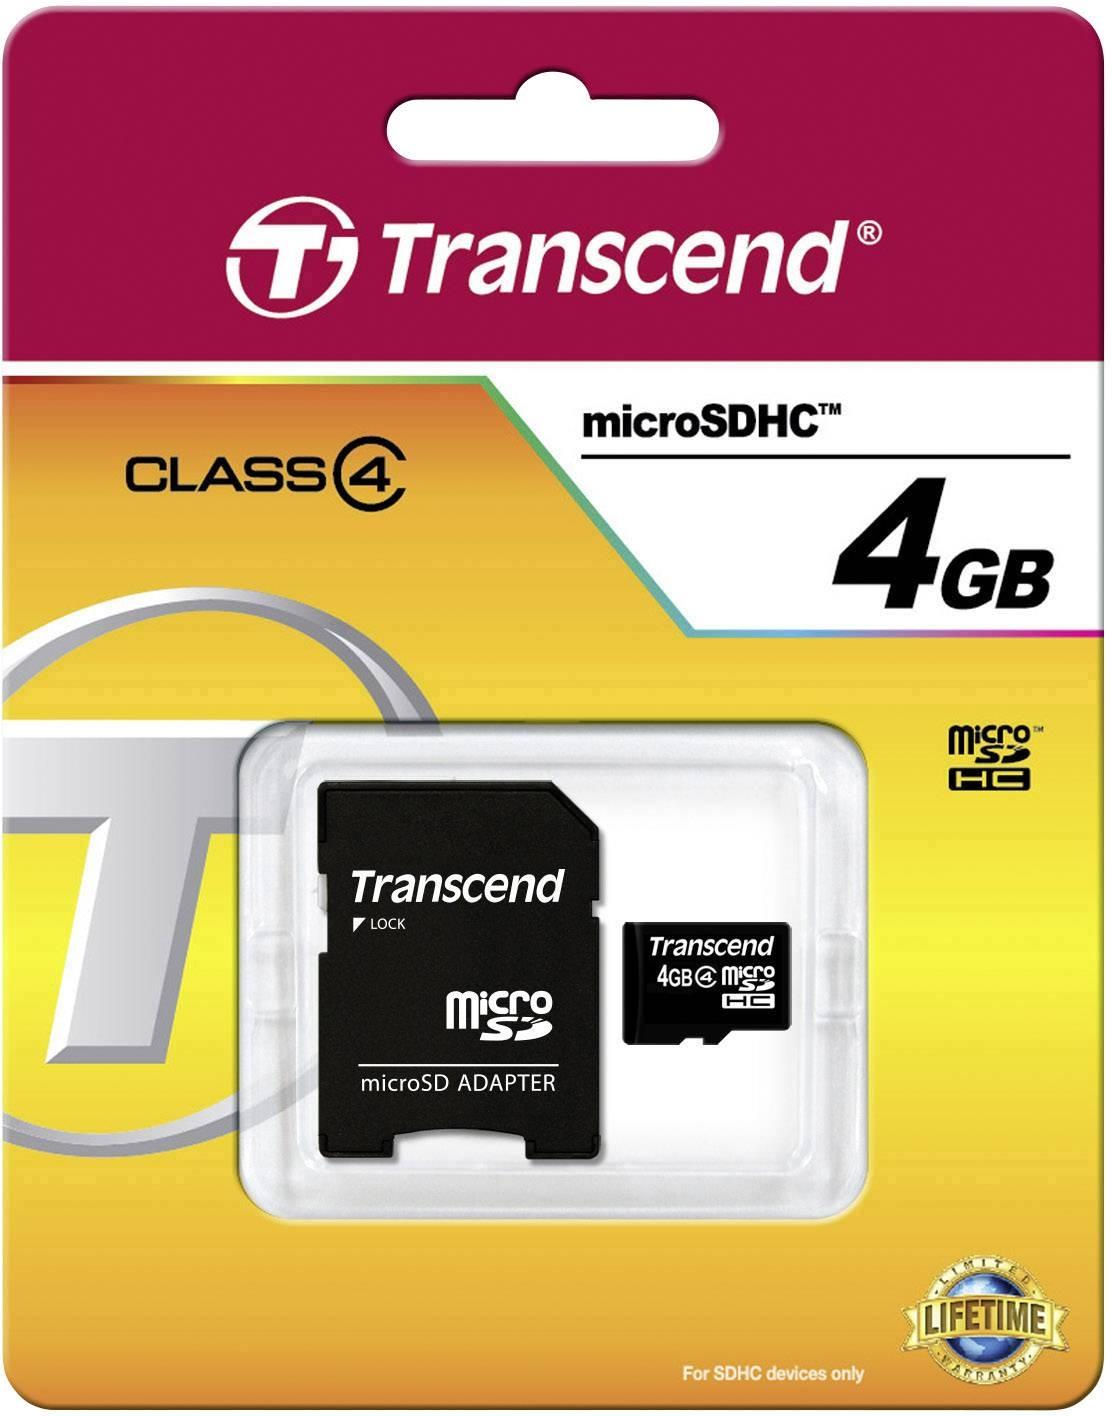 4 GB microSDHC Class, Speicherkarte